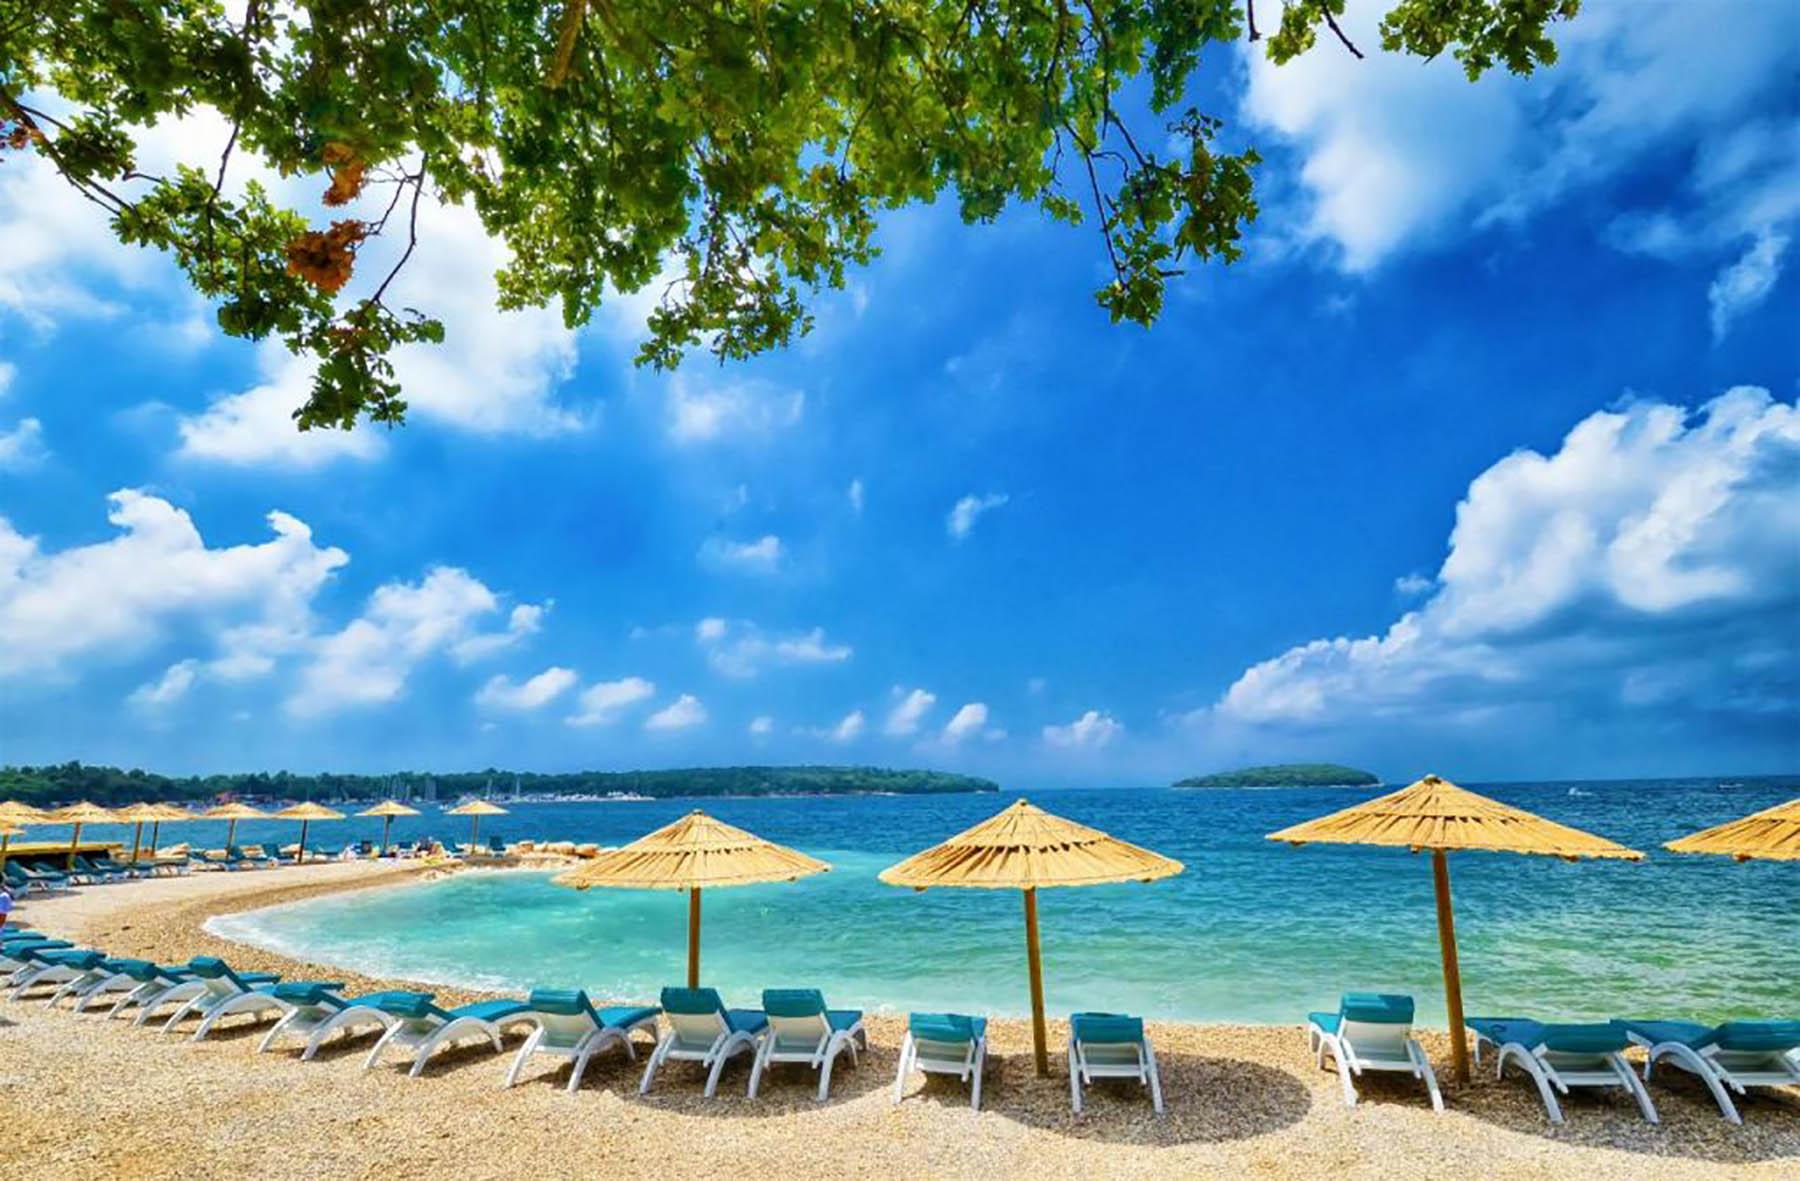 Strand Polidor Bei Funtana Online Strandfuhrer Kroati De